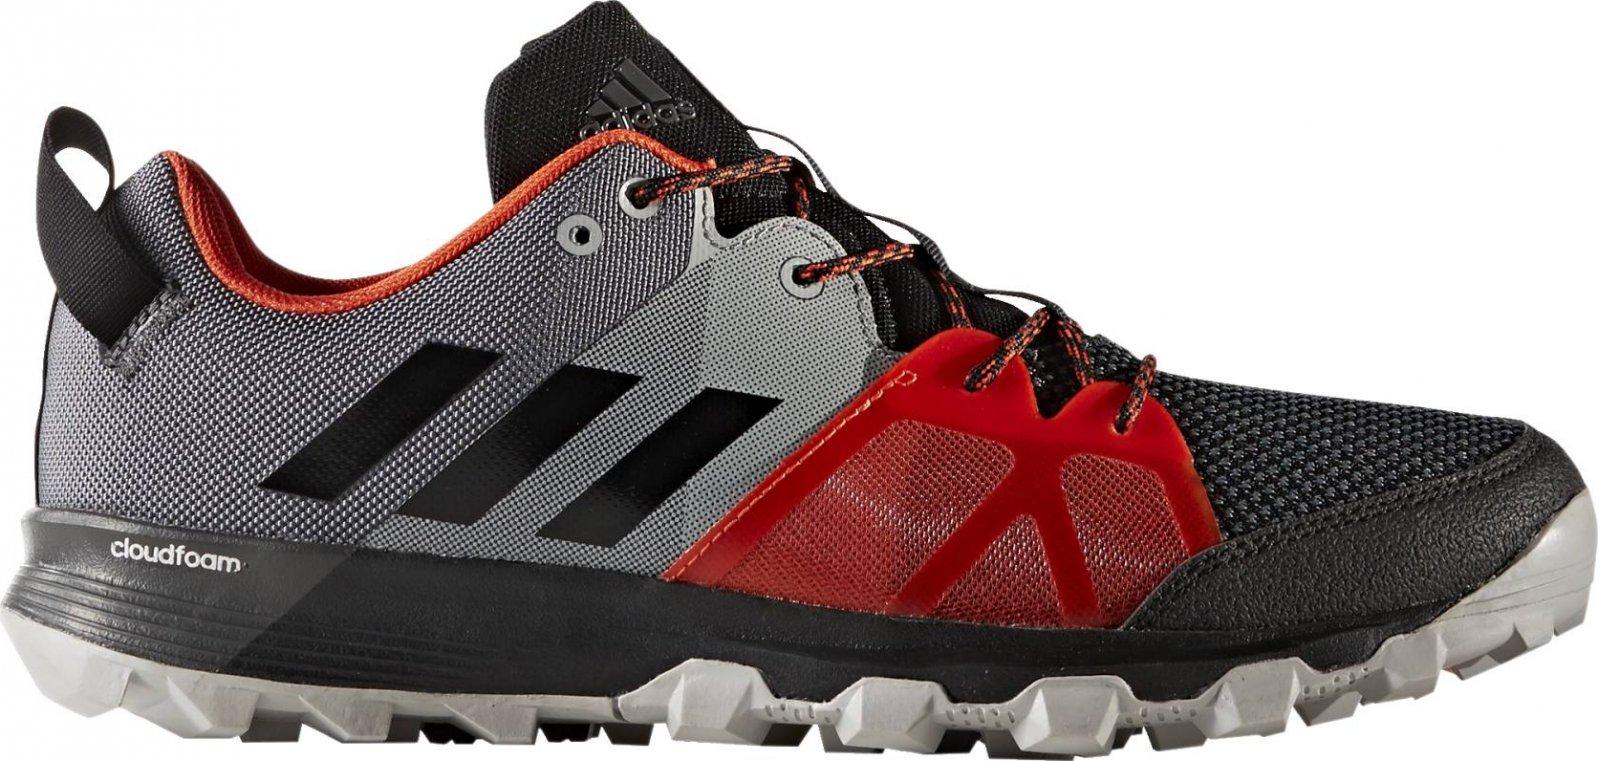 Adidas Kanadia 8.1 TR M černá červená od 2 364 Kč • Zboží.cz 4829723a18